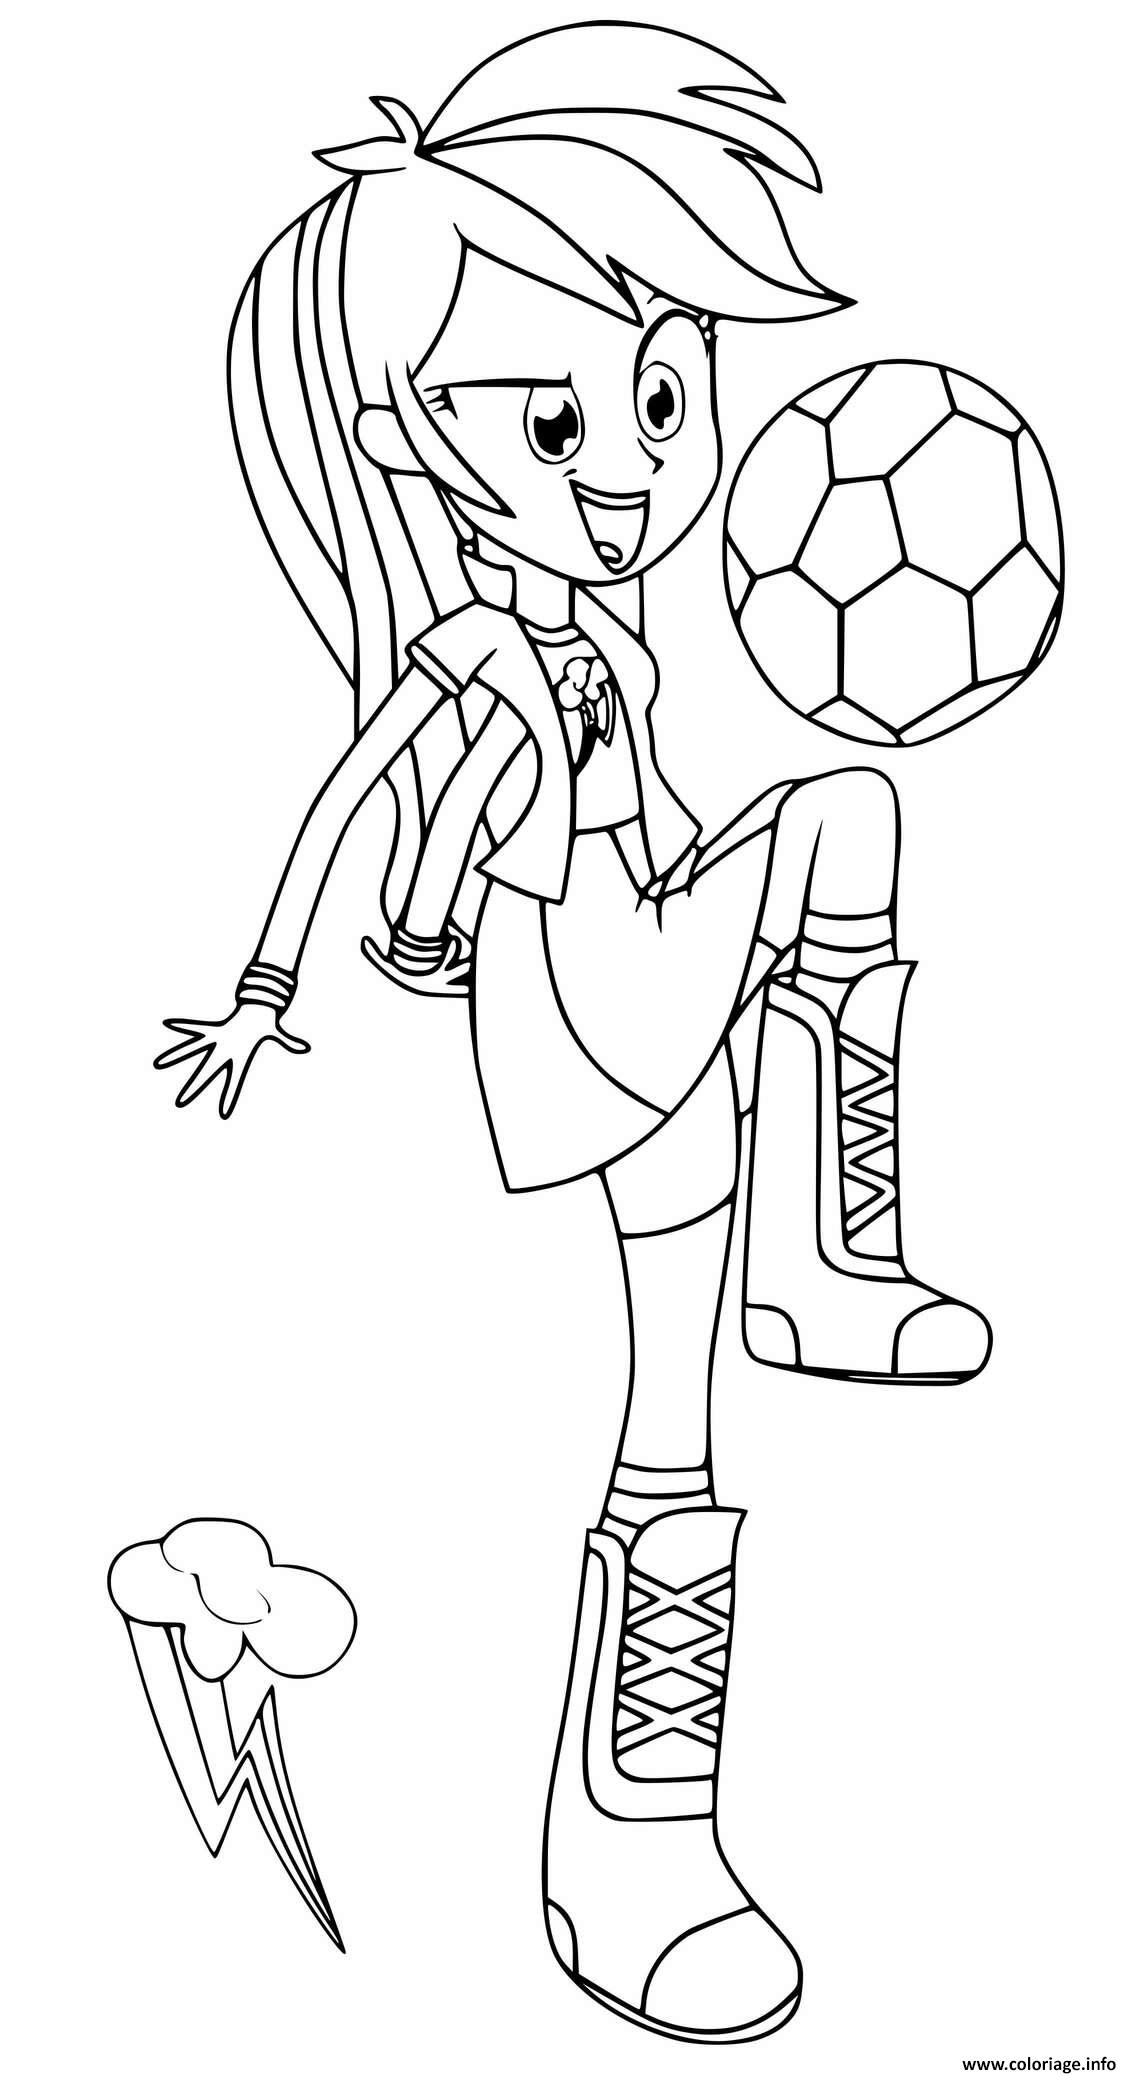 Dessin Equestria Girls Rainbow Dash Playing Football Coloriage Gratuit à Imprimer